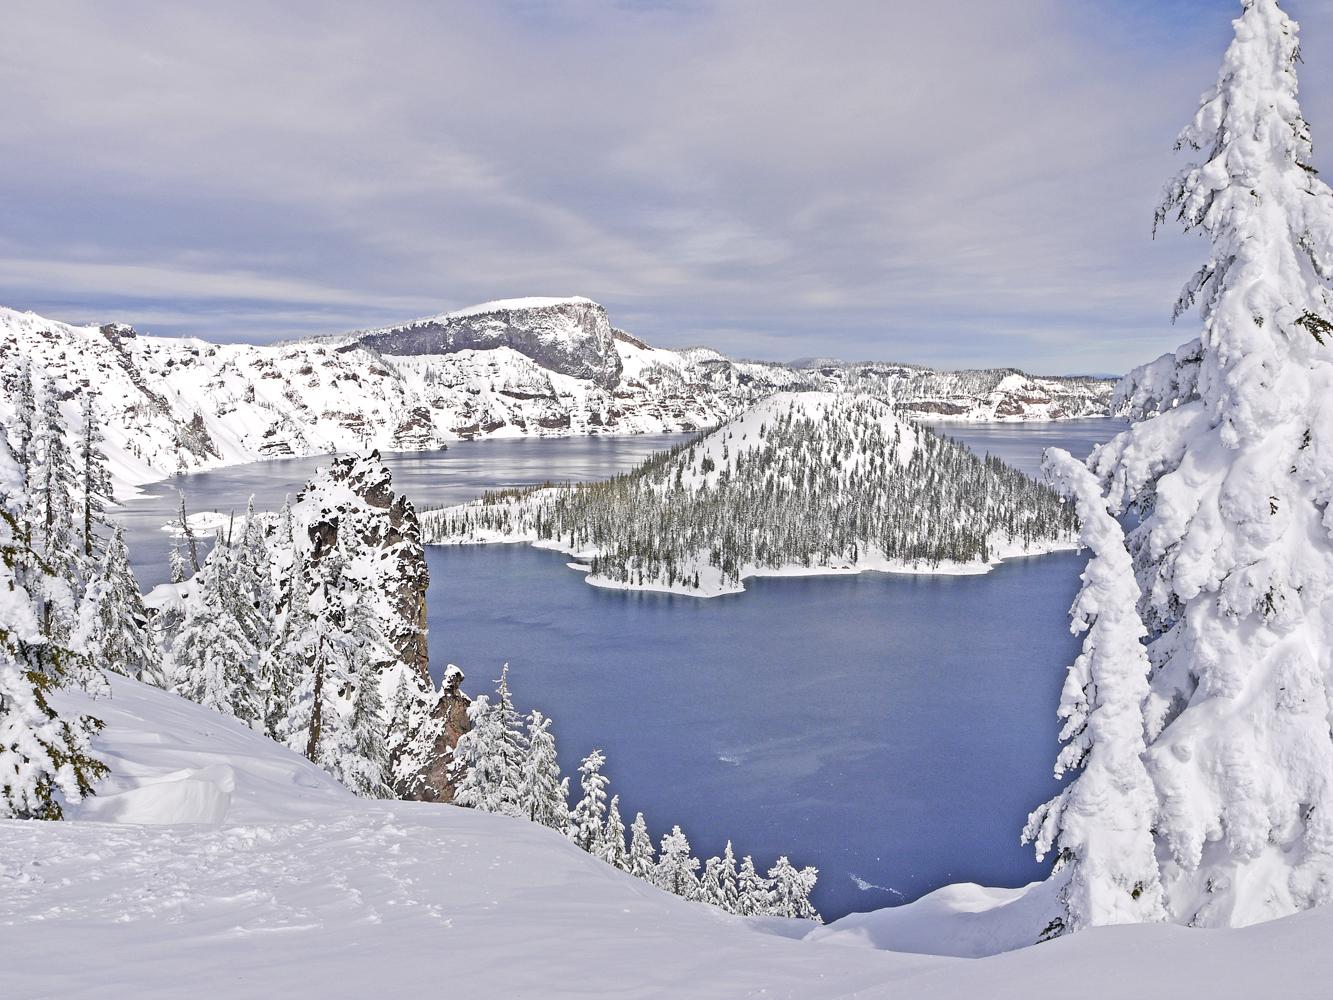 Crater Lake California To Bella Vista Travel Time